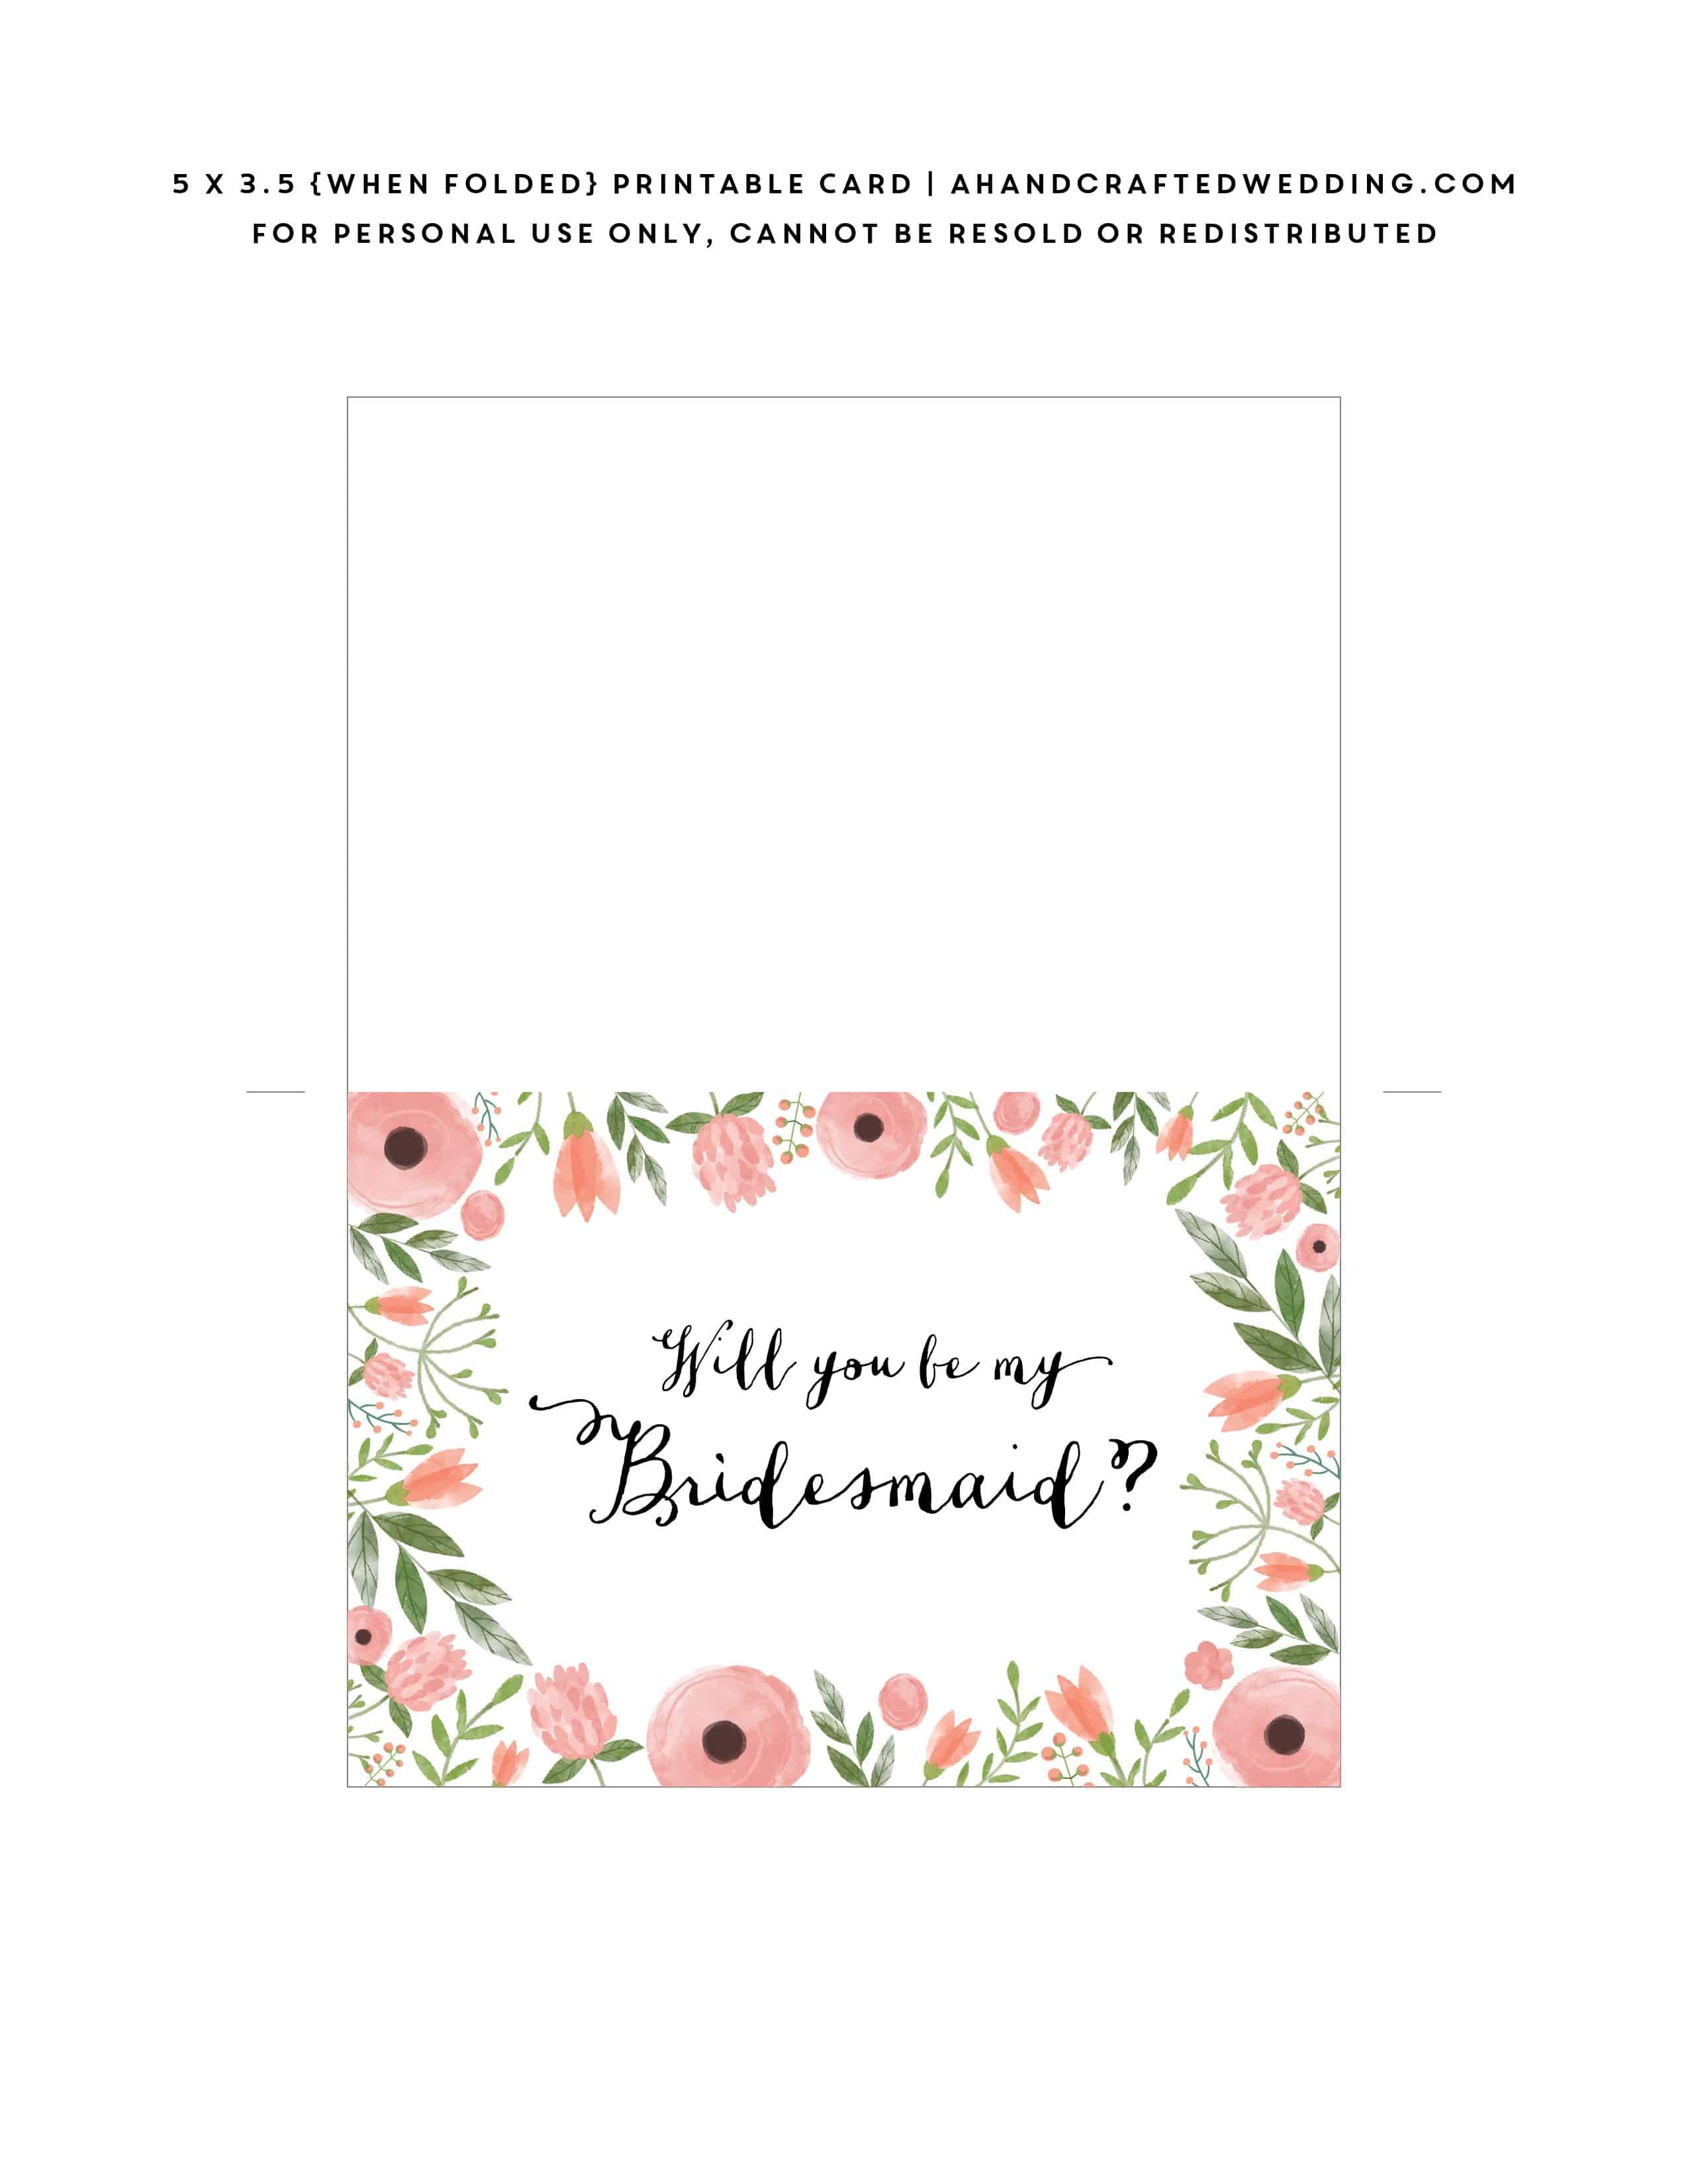 Free Printable Will You Be My Bridesmaid Card   Mountain Modern Life - Free Printable Will You Be My Bridesmaid Cards